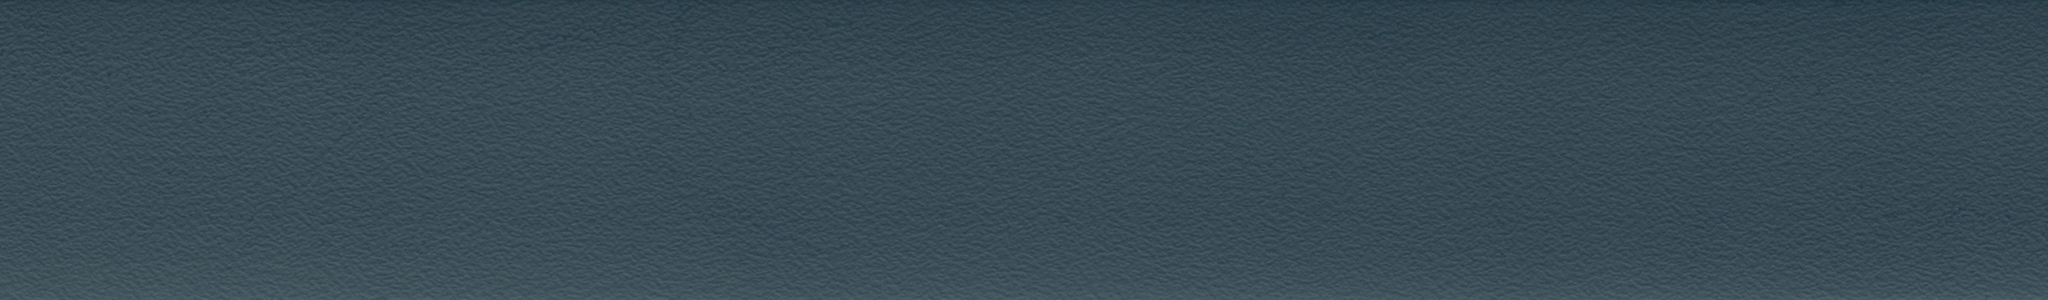 HU 15599 ABS Kante UNI Blau Indigo soft perl XG